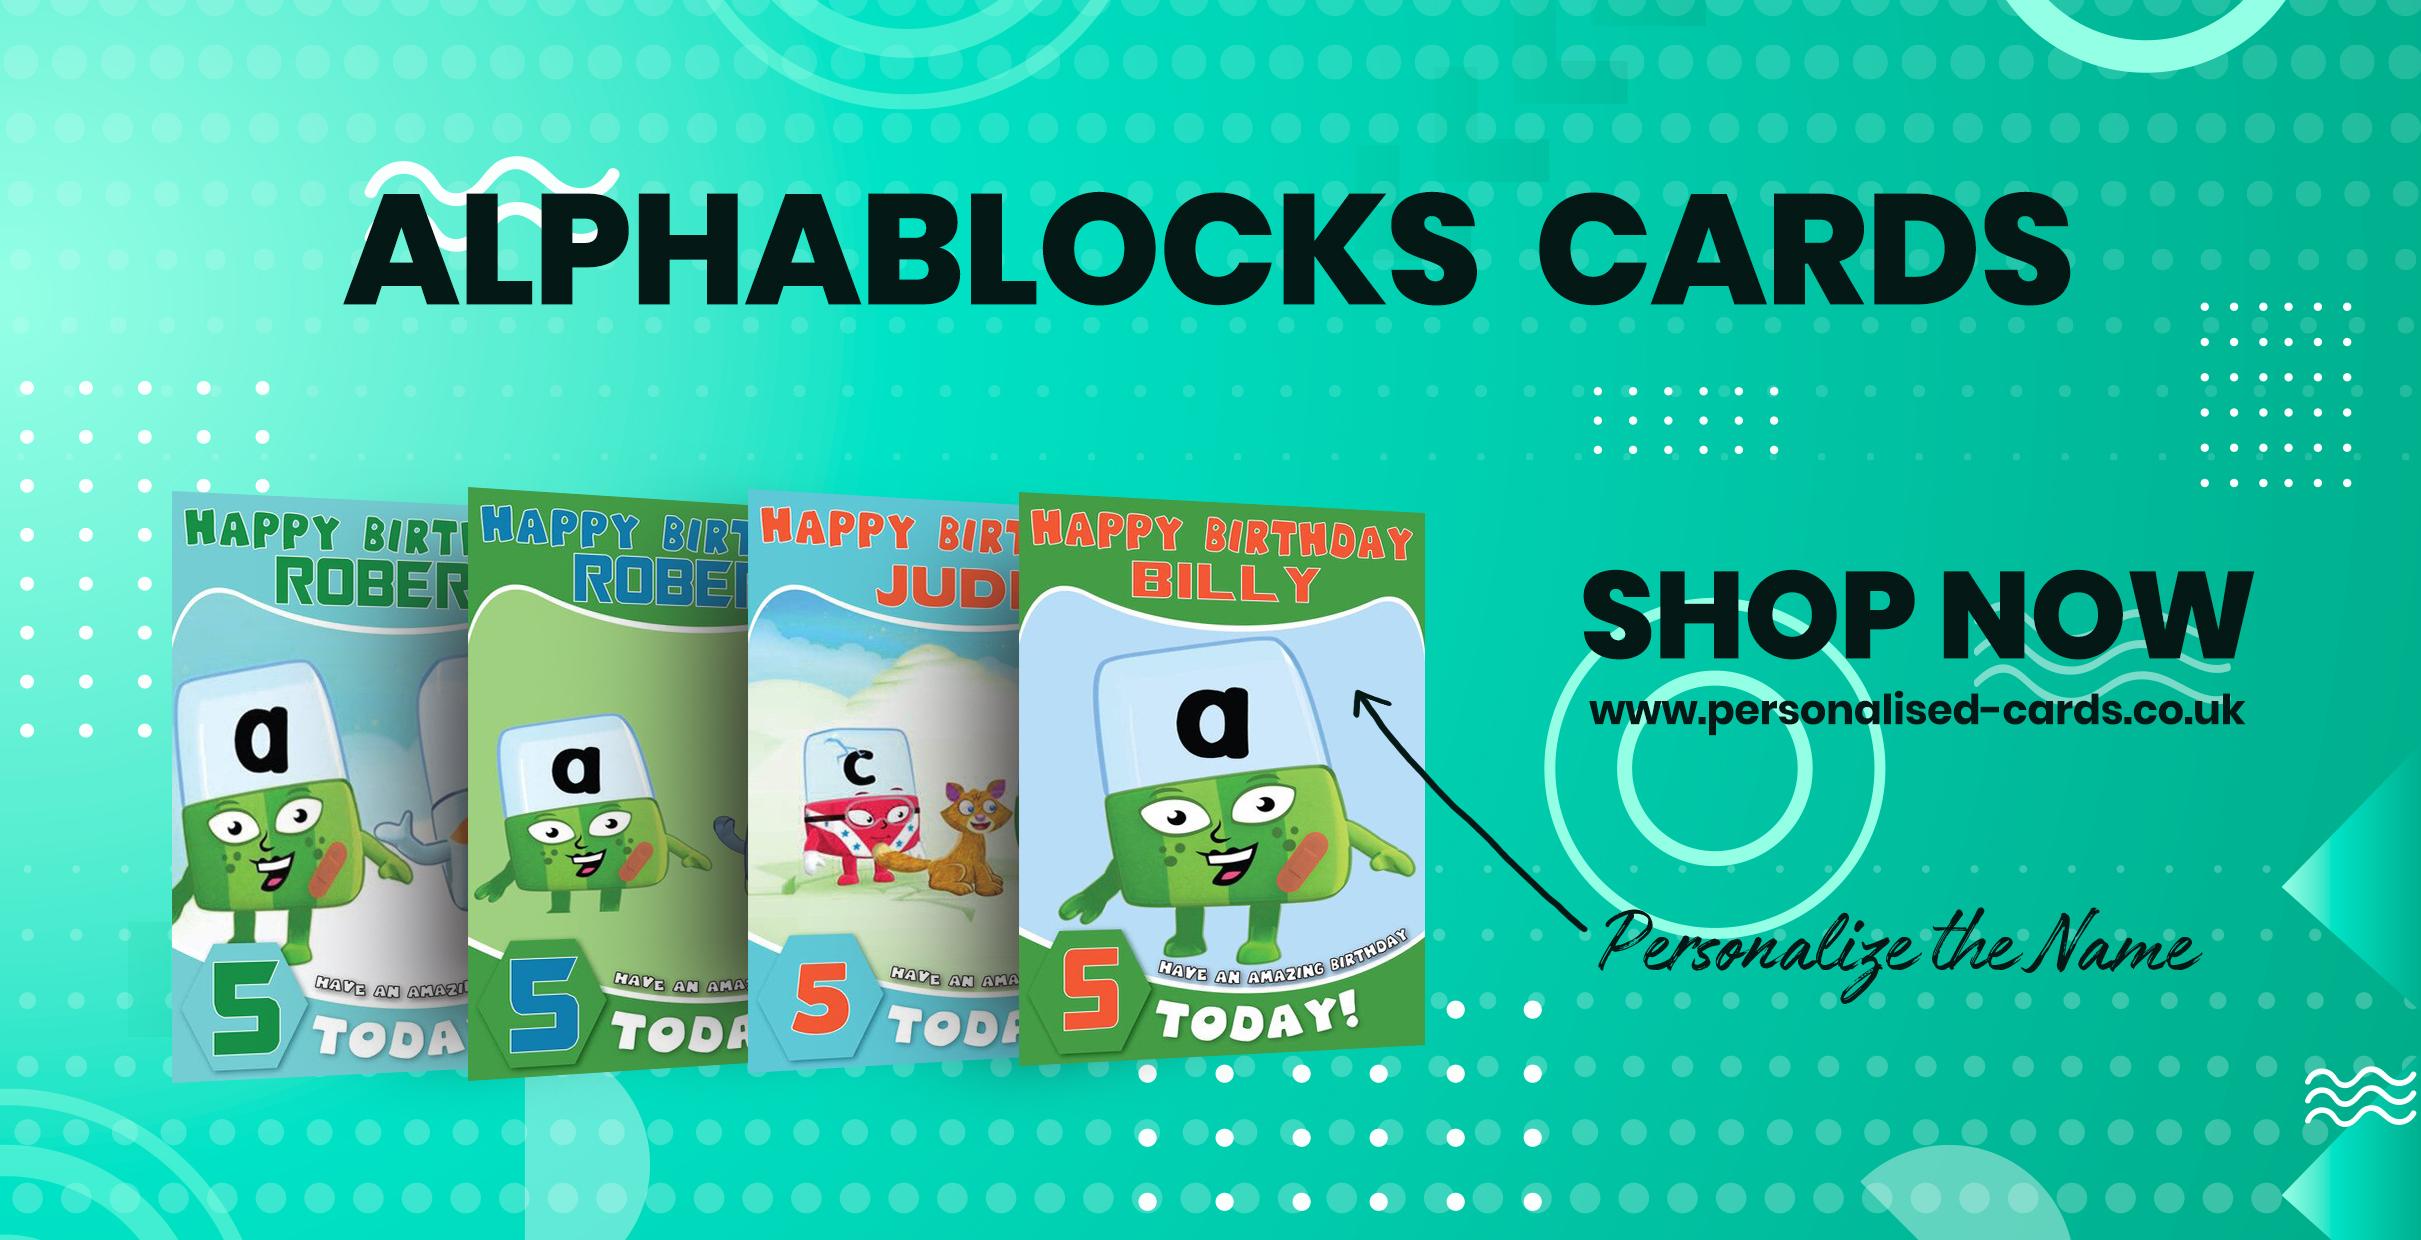 alphablocks-cards.jpg